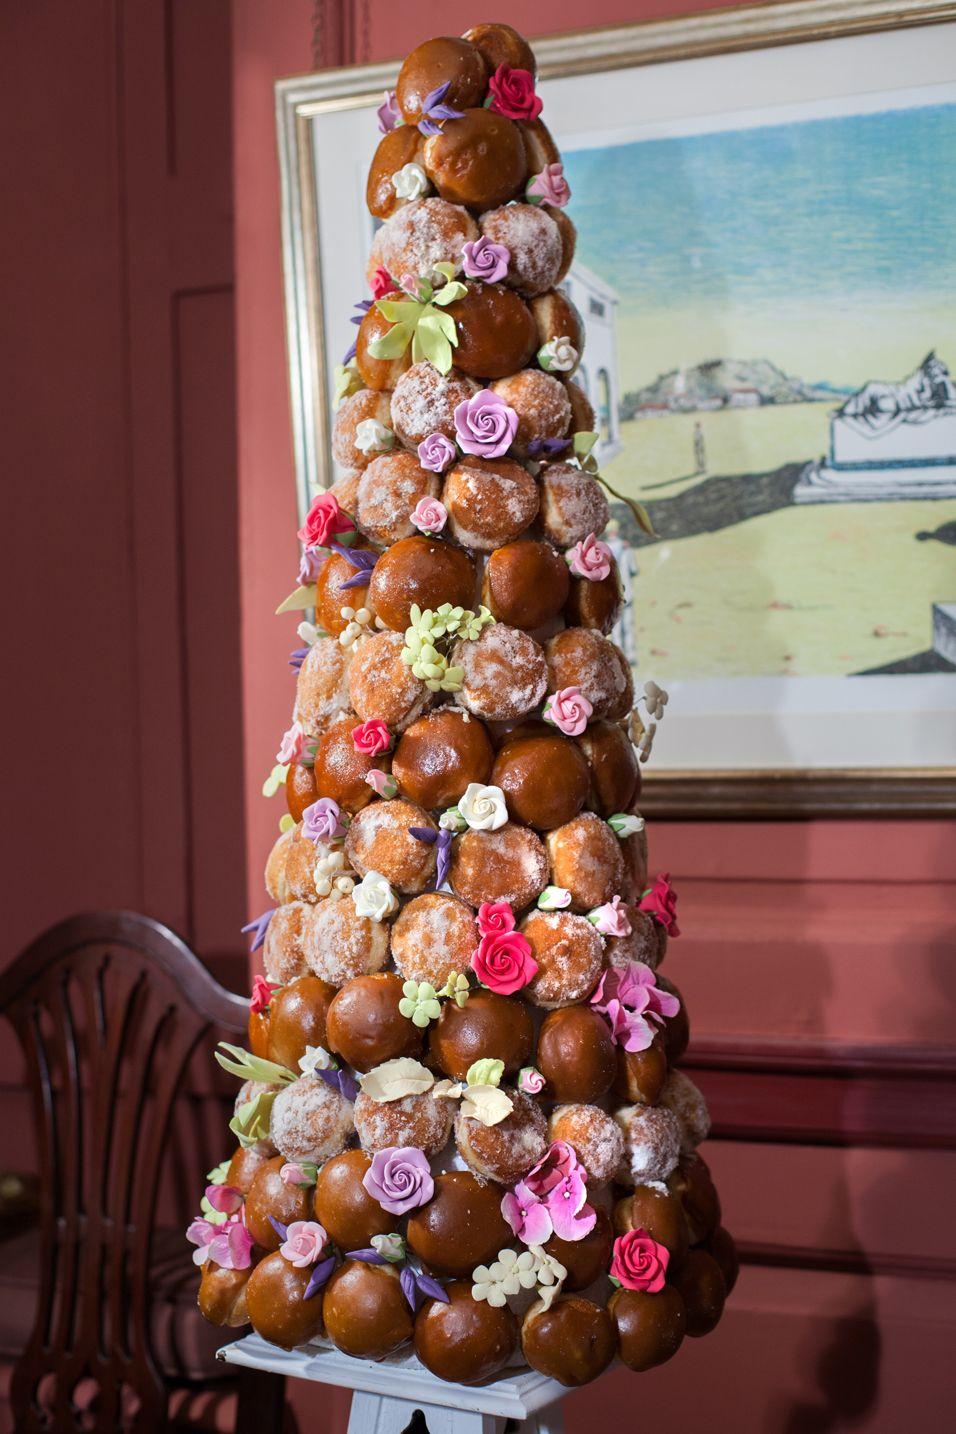 cake-hotel-made-from-sugar